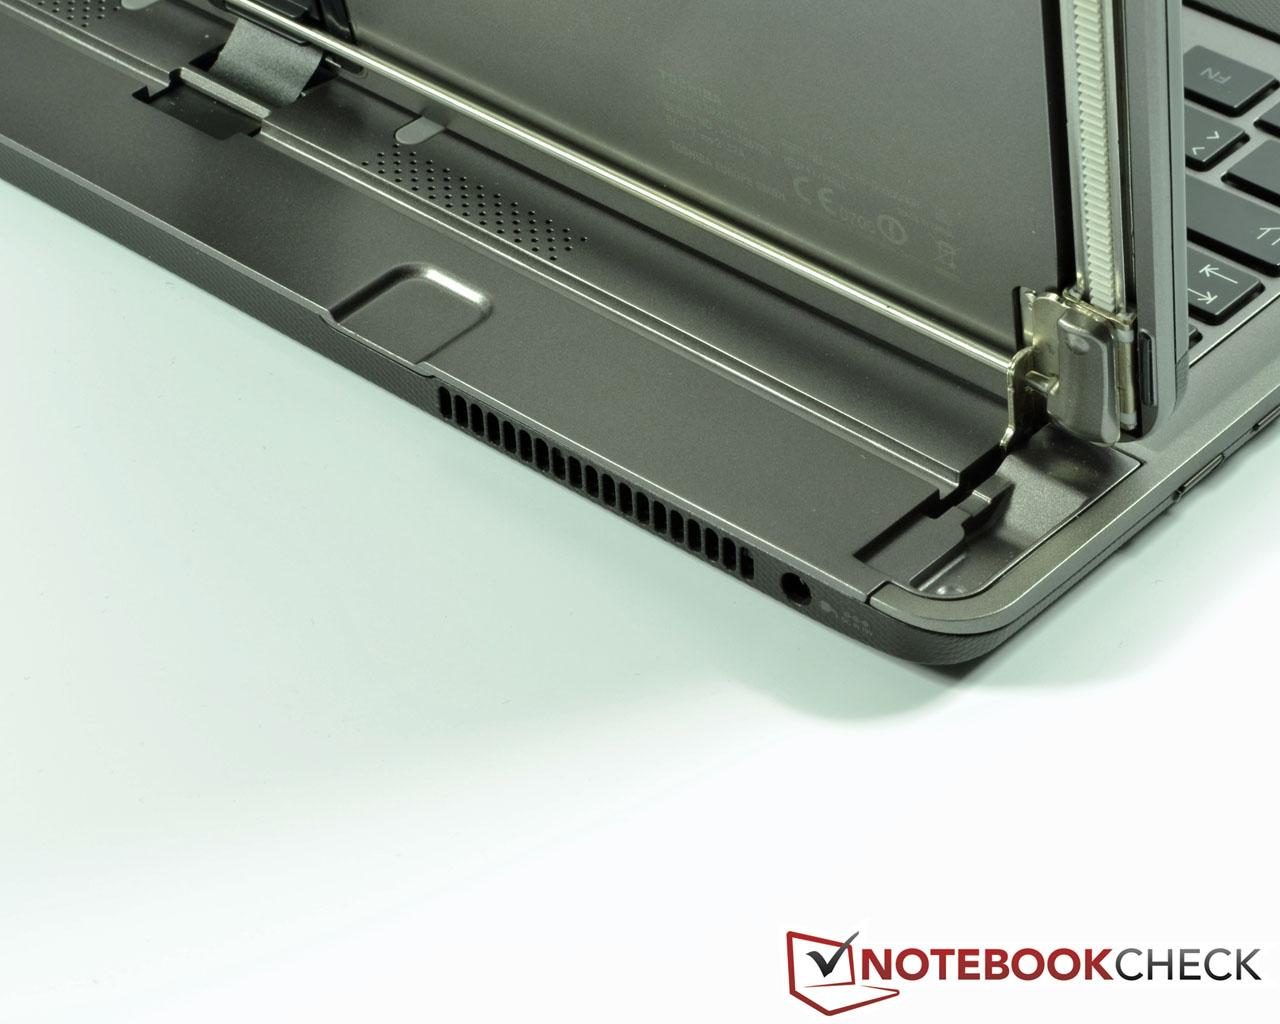 Review Toshiba Satellite U920t-100 Ultrabook ...